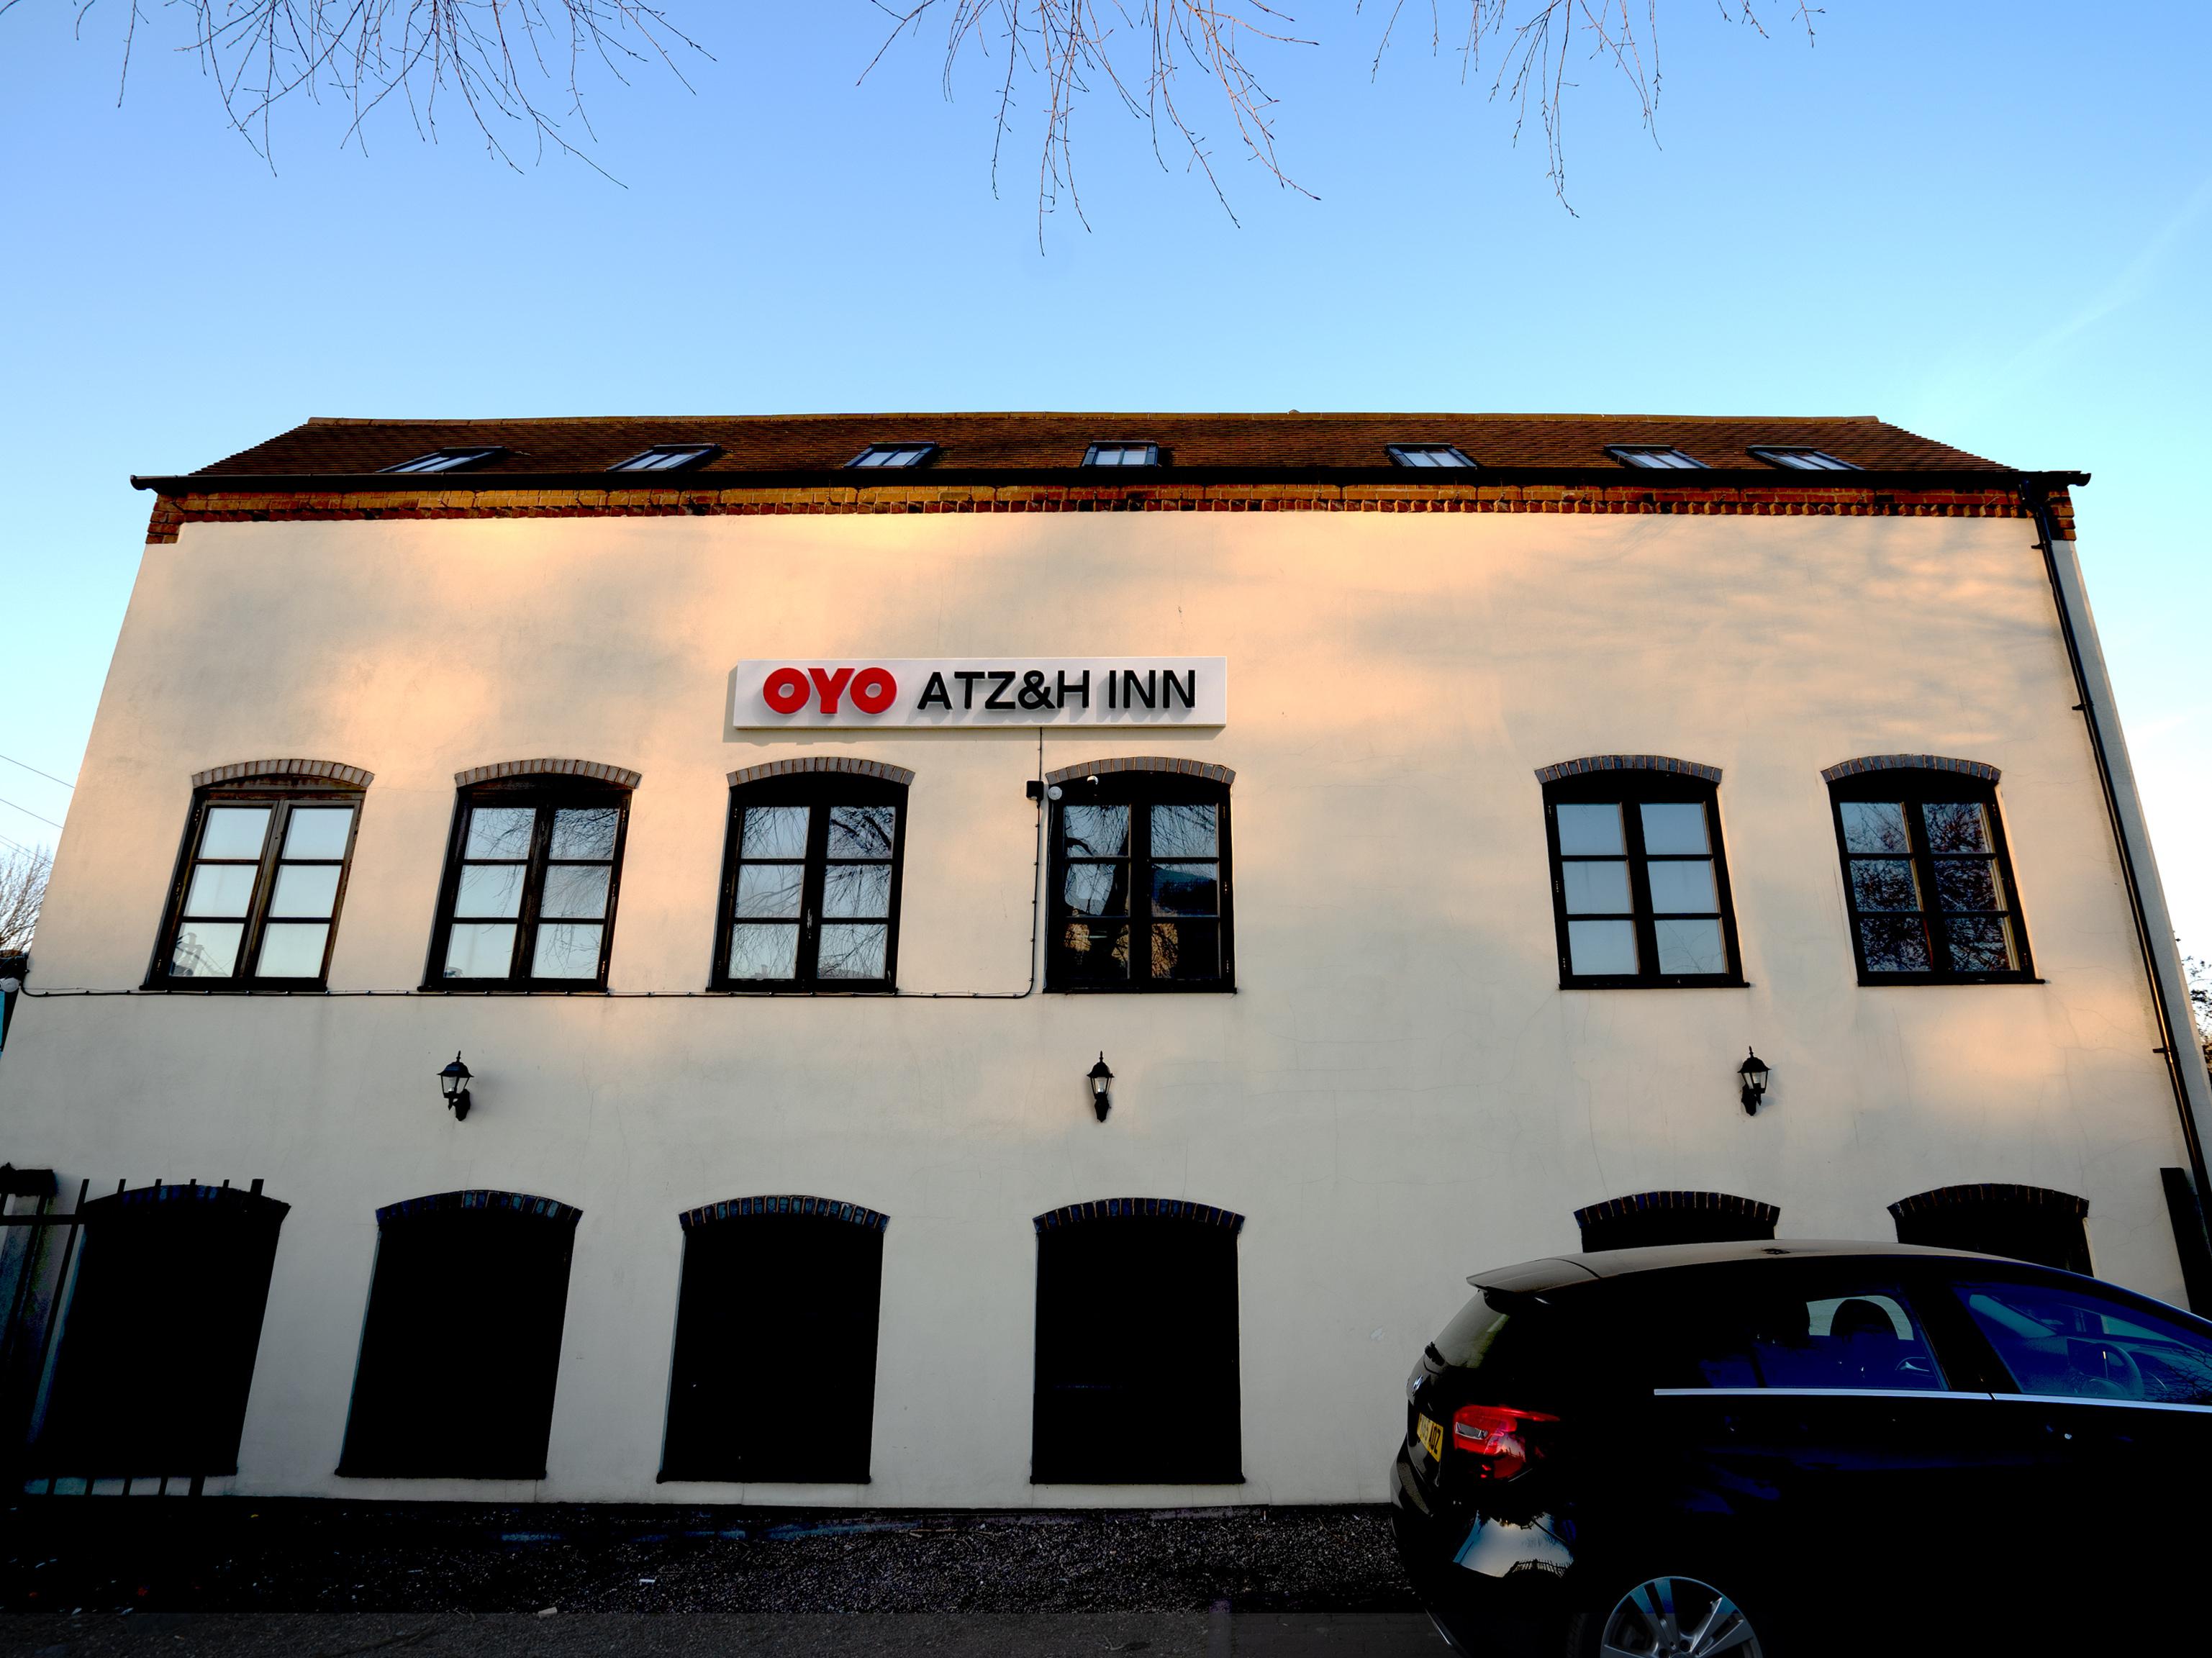 OYO ATZ&H Inn, Walsall